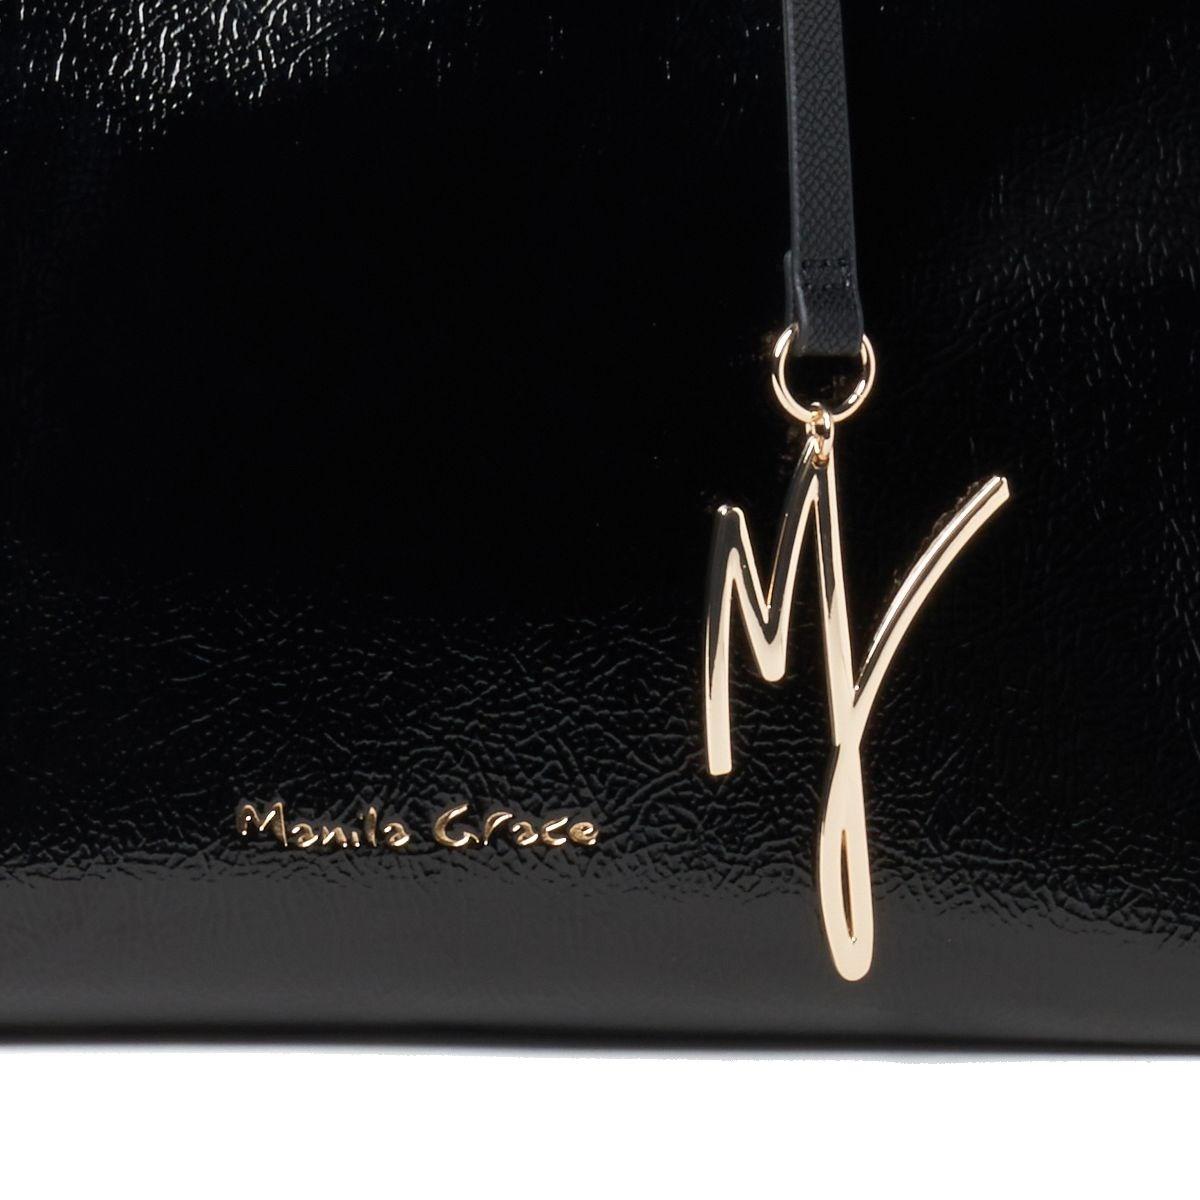 Manila Grace[マニラグレース]  W0A B028EU-MD500 バッグ ブラック